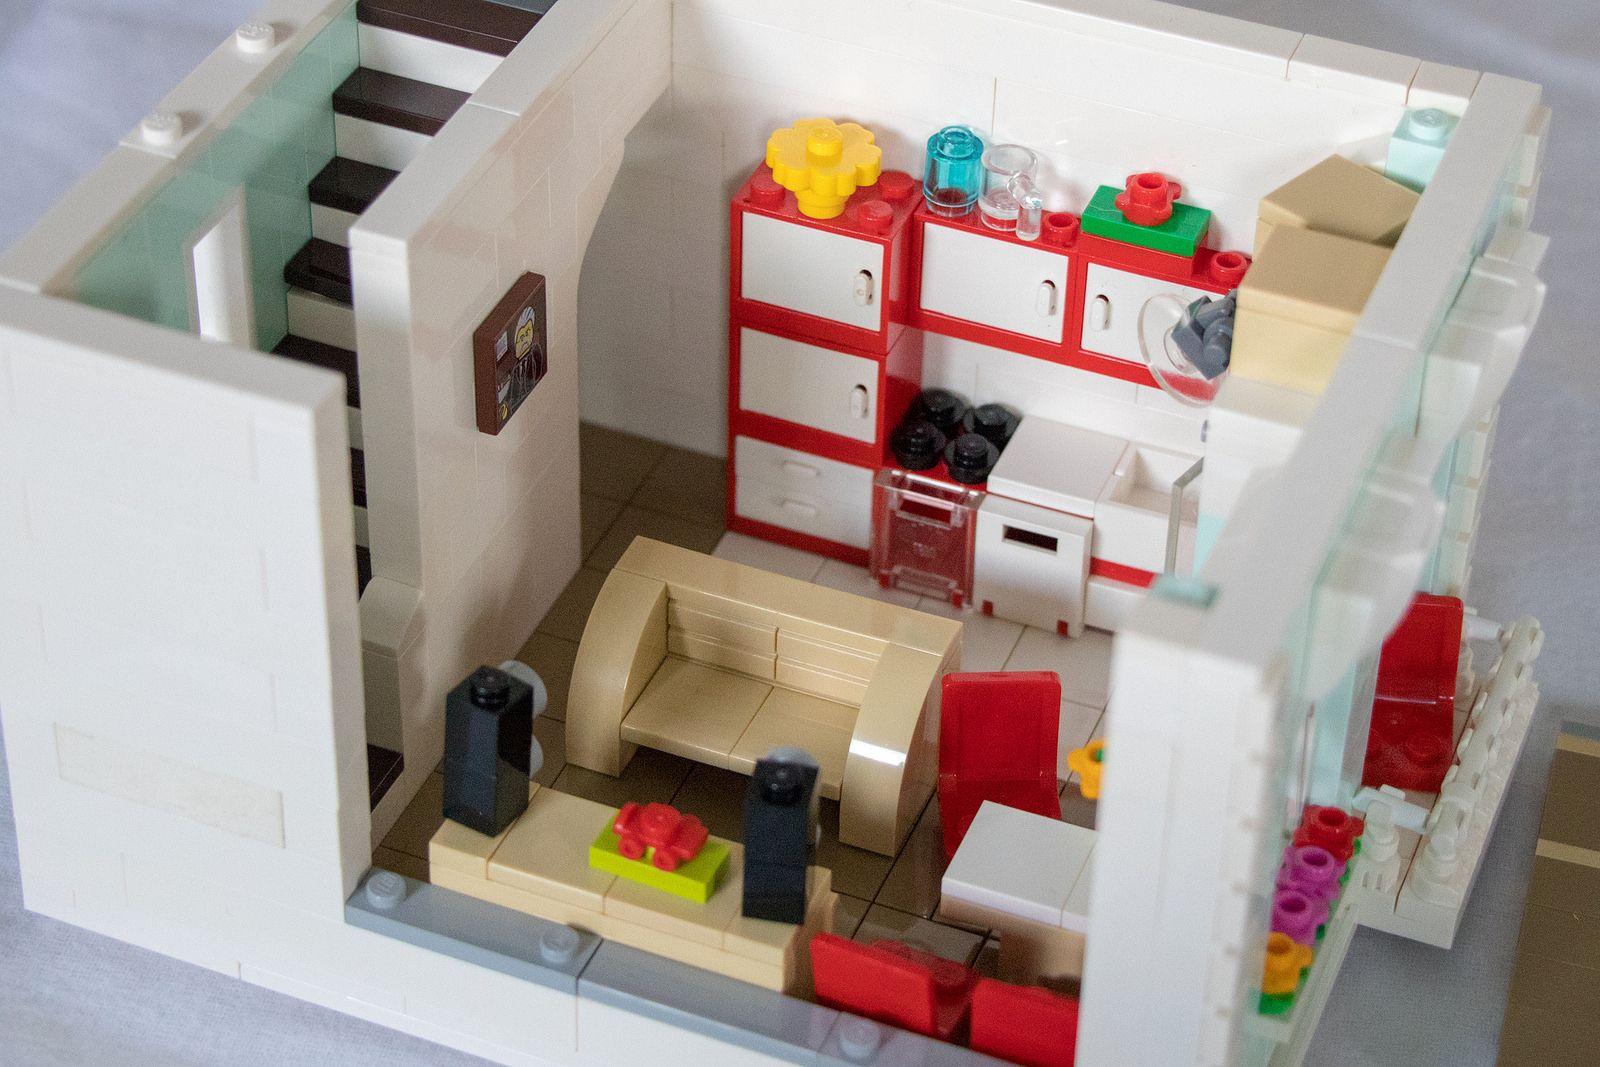 Living room and kitchen 12   Lego furniture, Lego room, Lego design